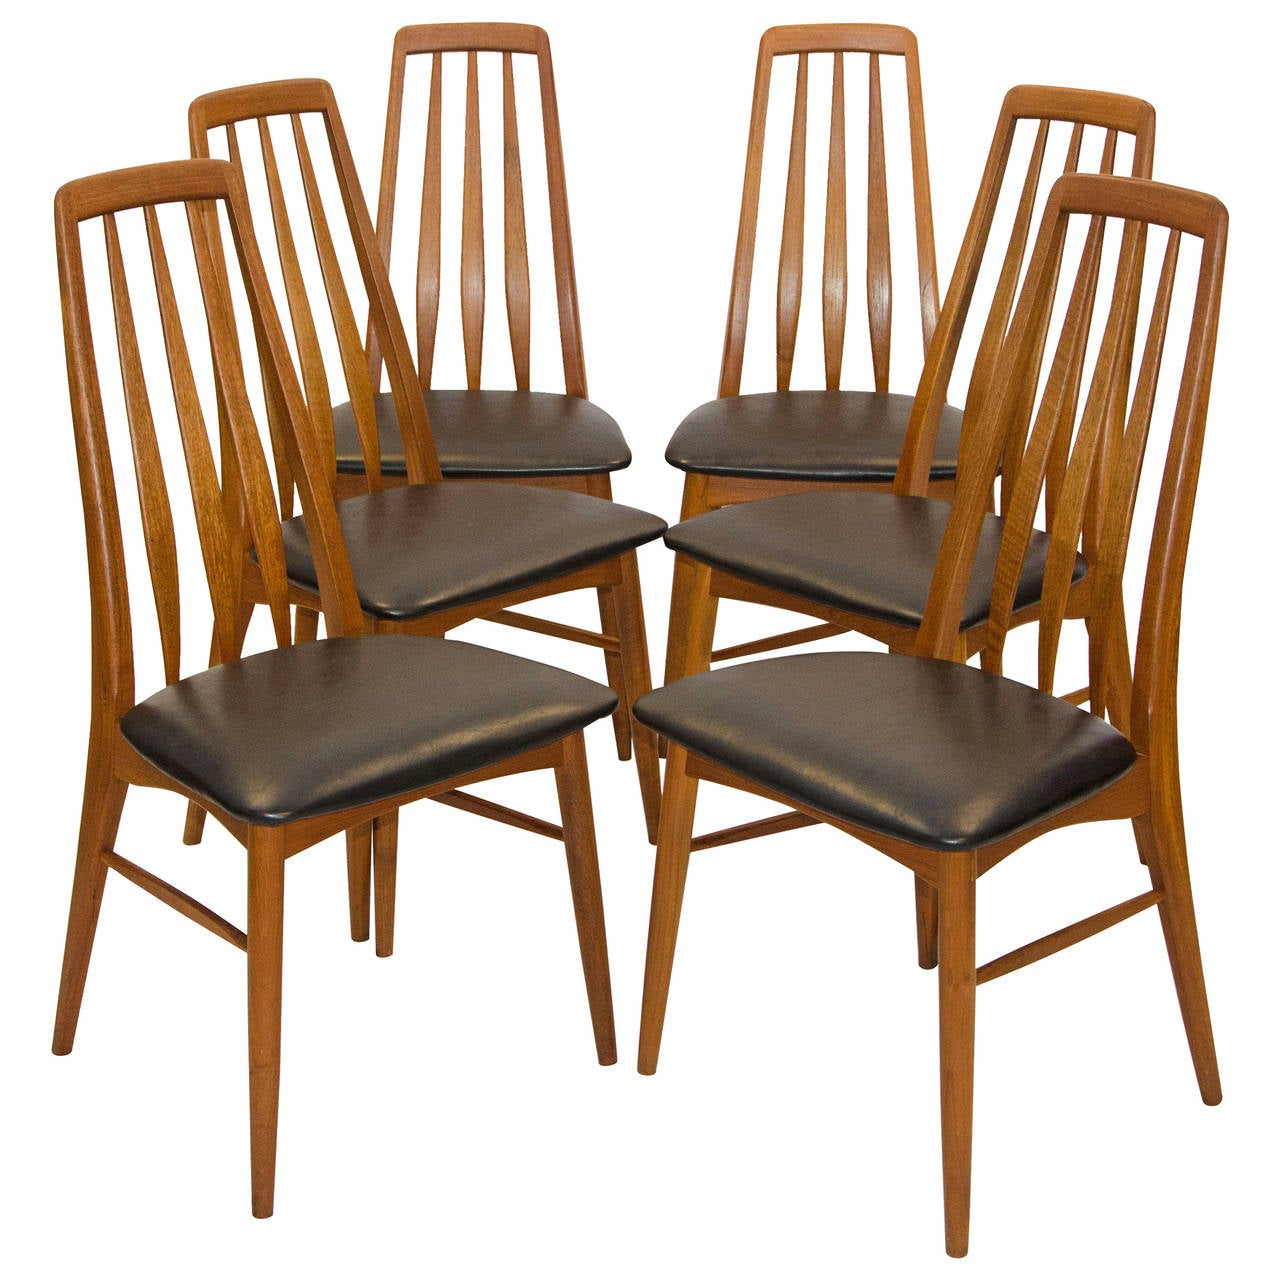 Six Danish Teak Dining Chairs Koefoed Hornslet